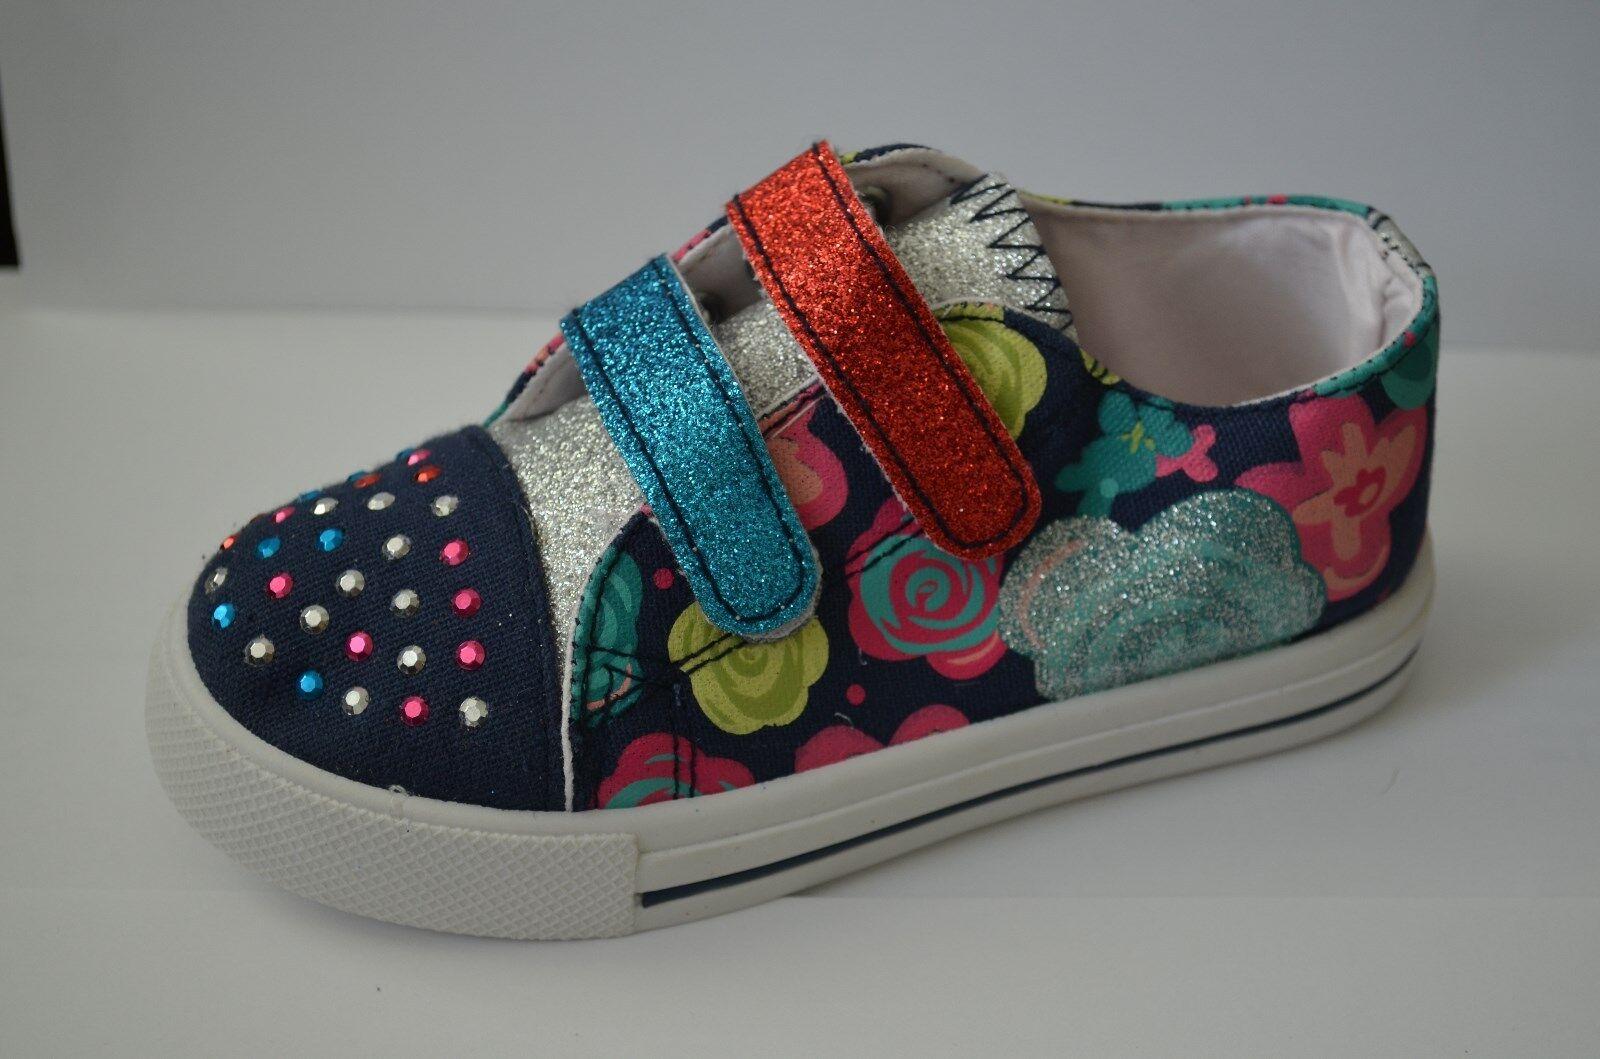 085e377e2ed751 Kinder Schuhe Bunte Sneaker für Mädchen Laufschuhe Freizeitschuhe  Sportschuhe